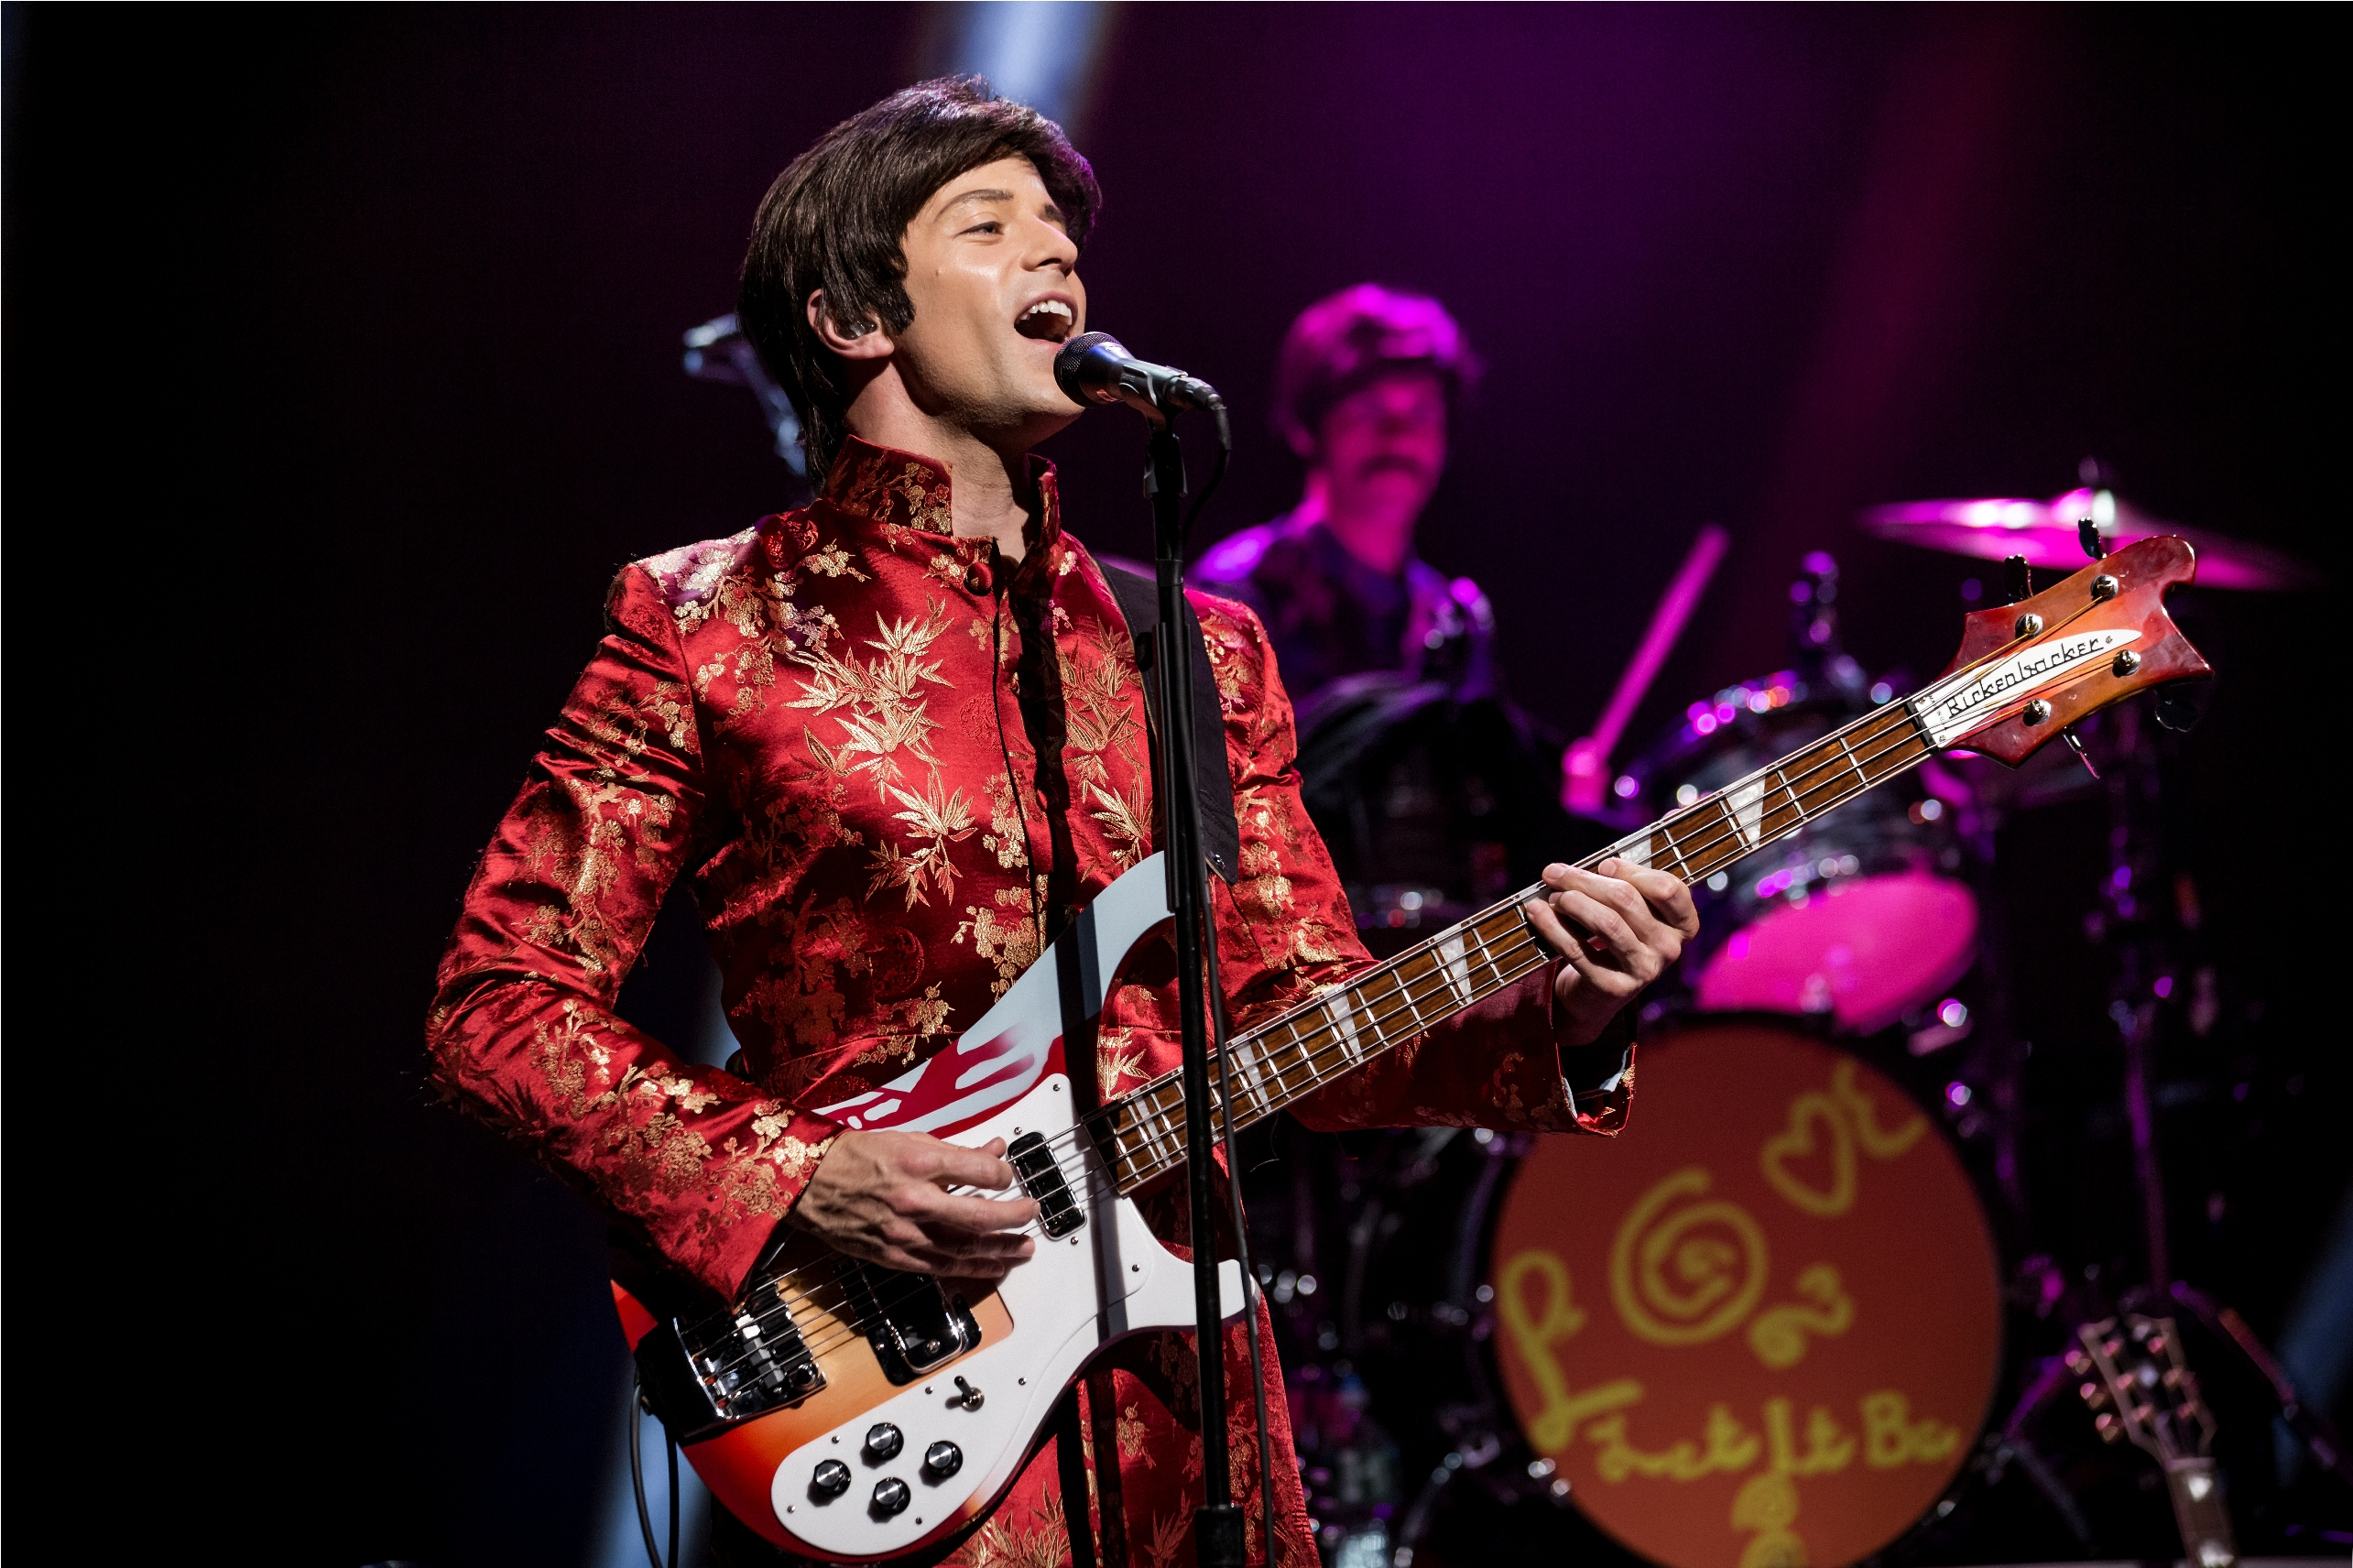 More Beatles, Bob Dylan, & Toto - Collectors Music Reviews